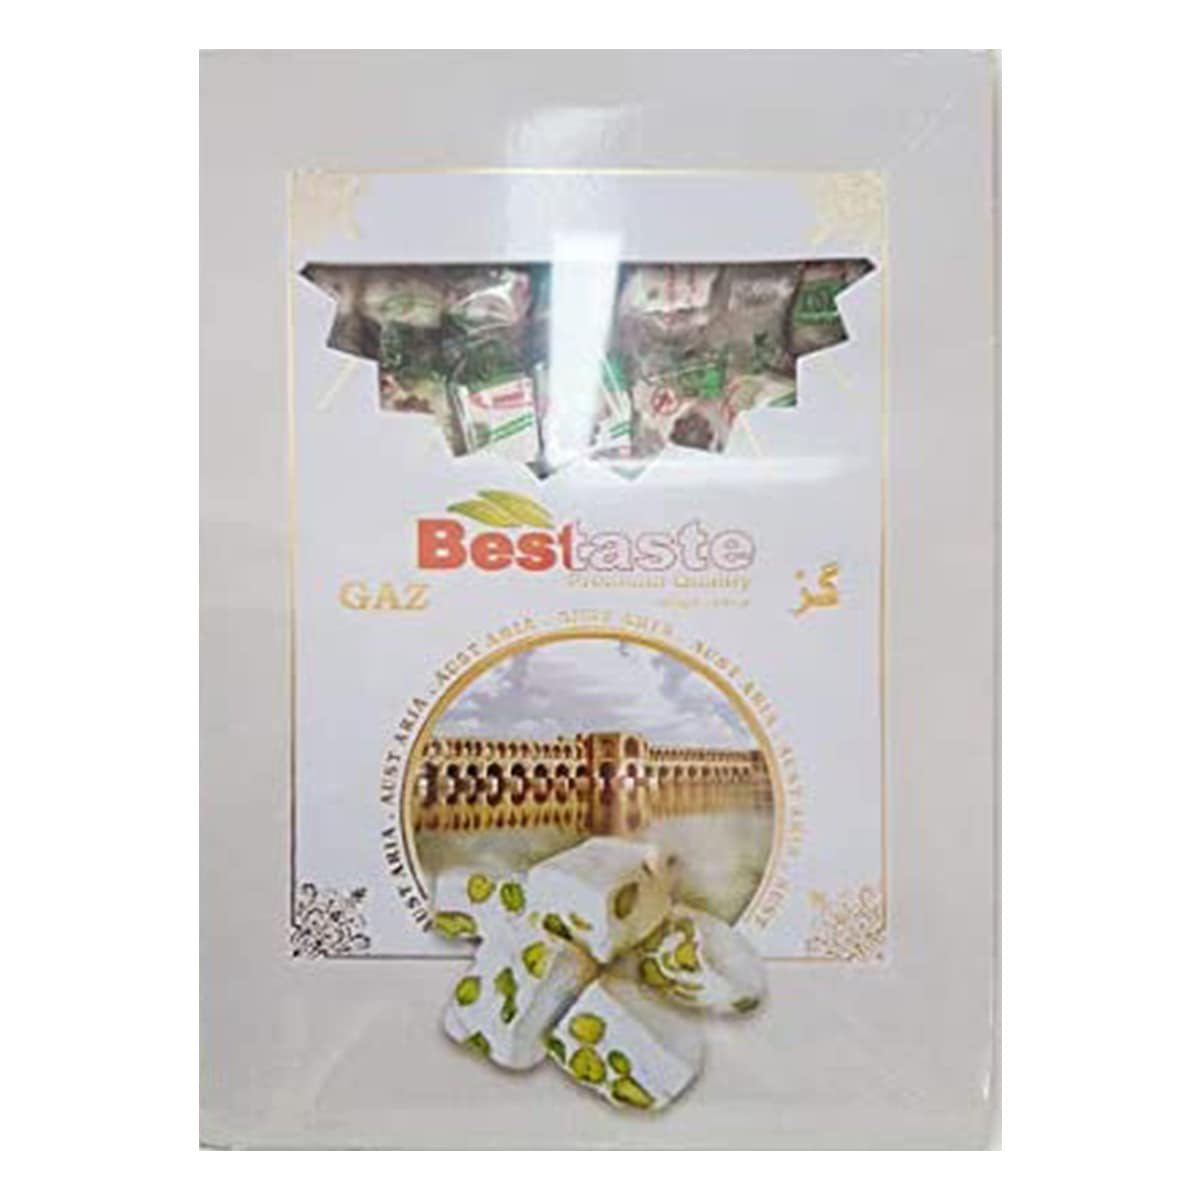 Buy Bestaste Ahmadi and Sons Gaz Noghat / Nougat Pack (Pistachio) - 450 gm